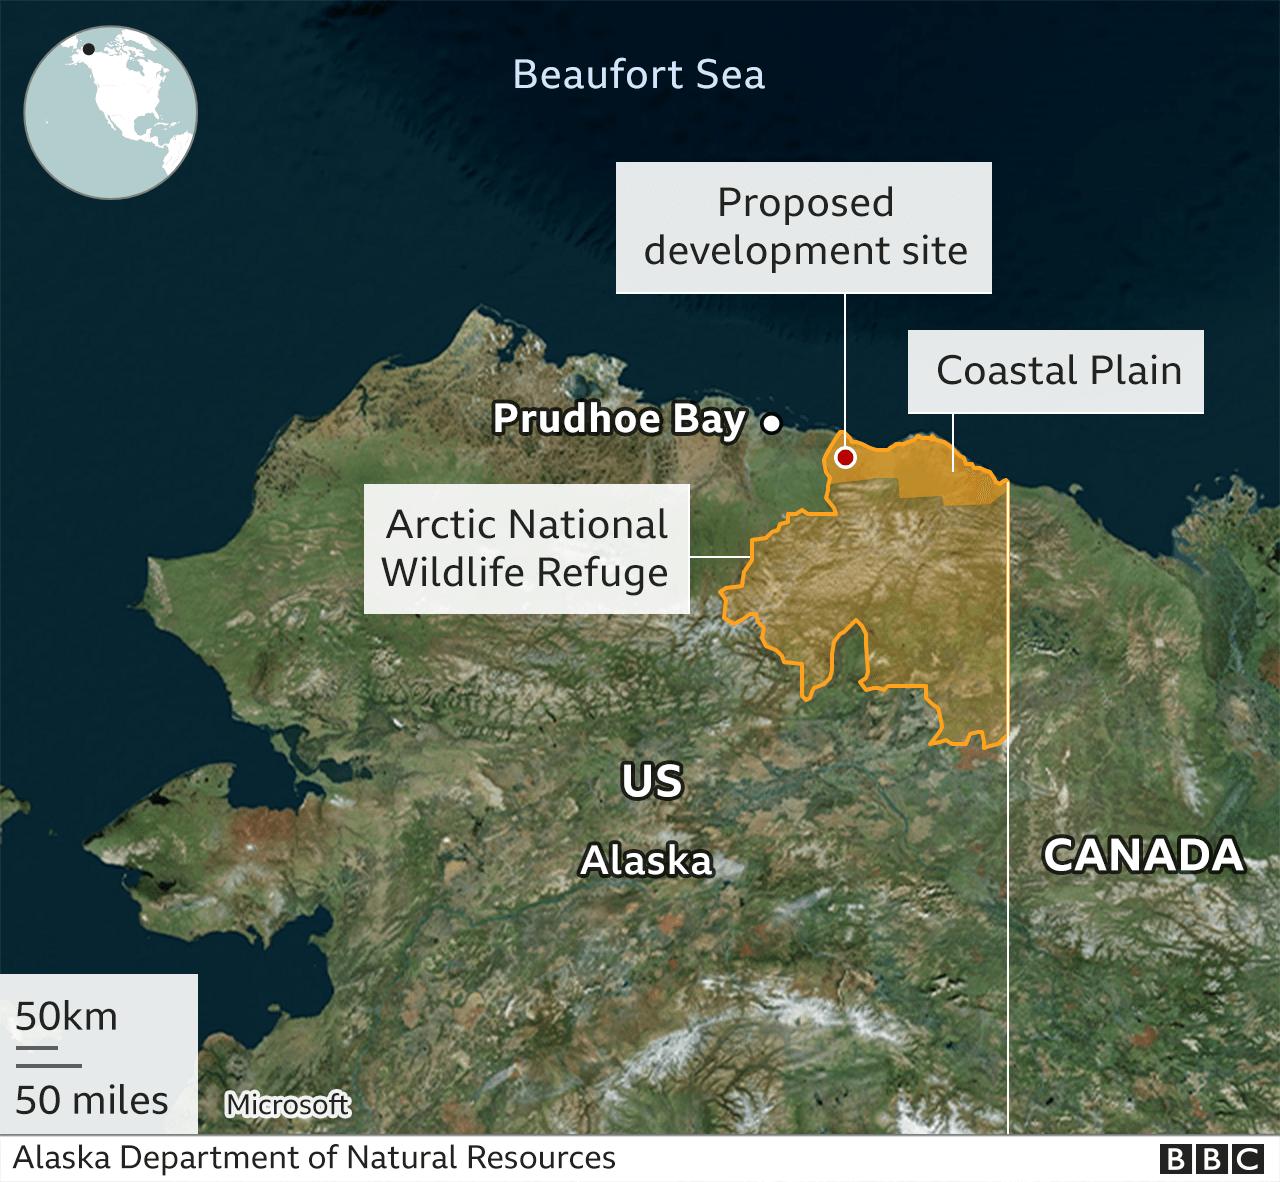 Map showing Arctic National Wildlife Refuge in Alaska